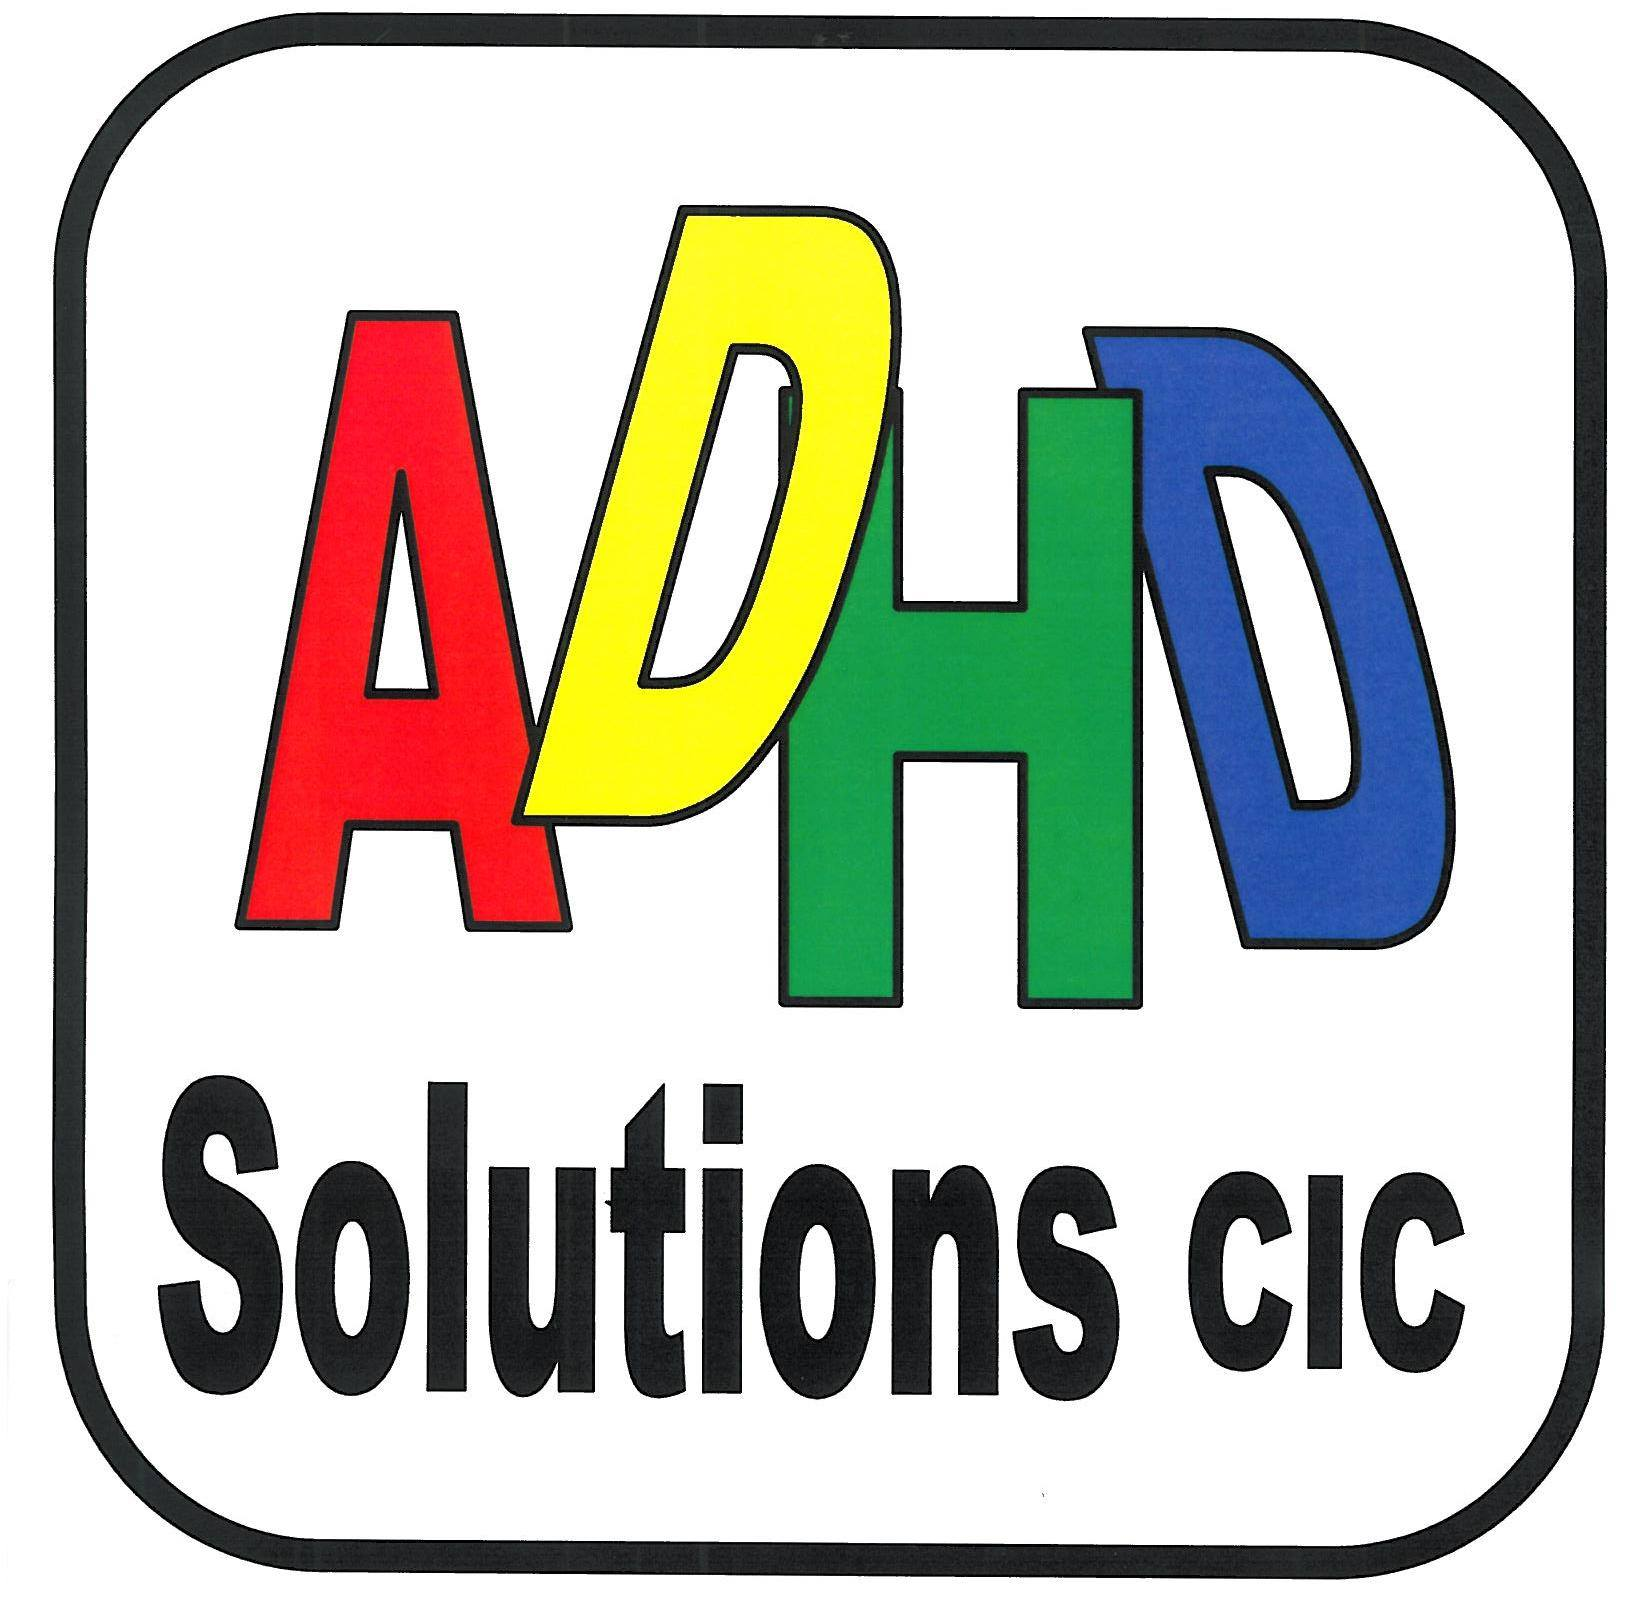 ADHD Solutions logo